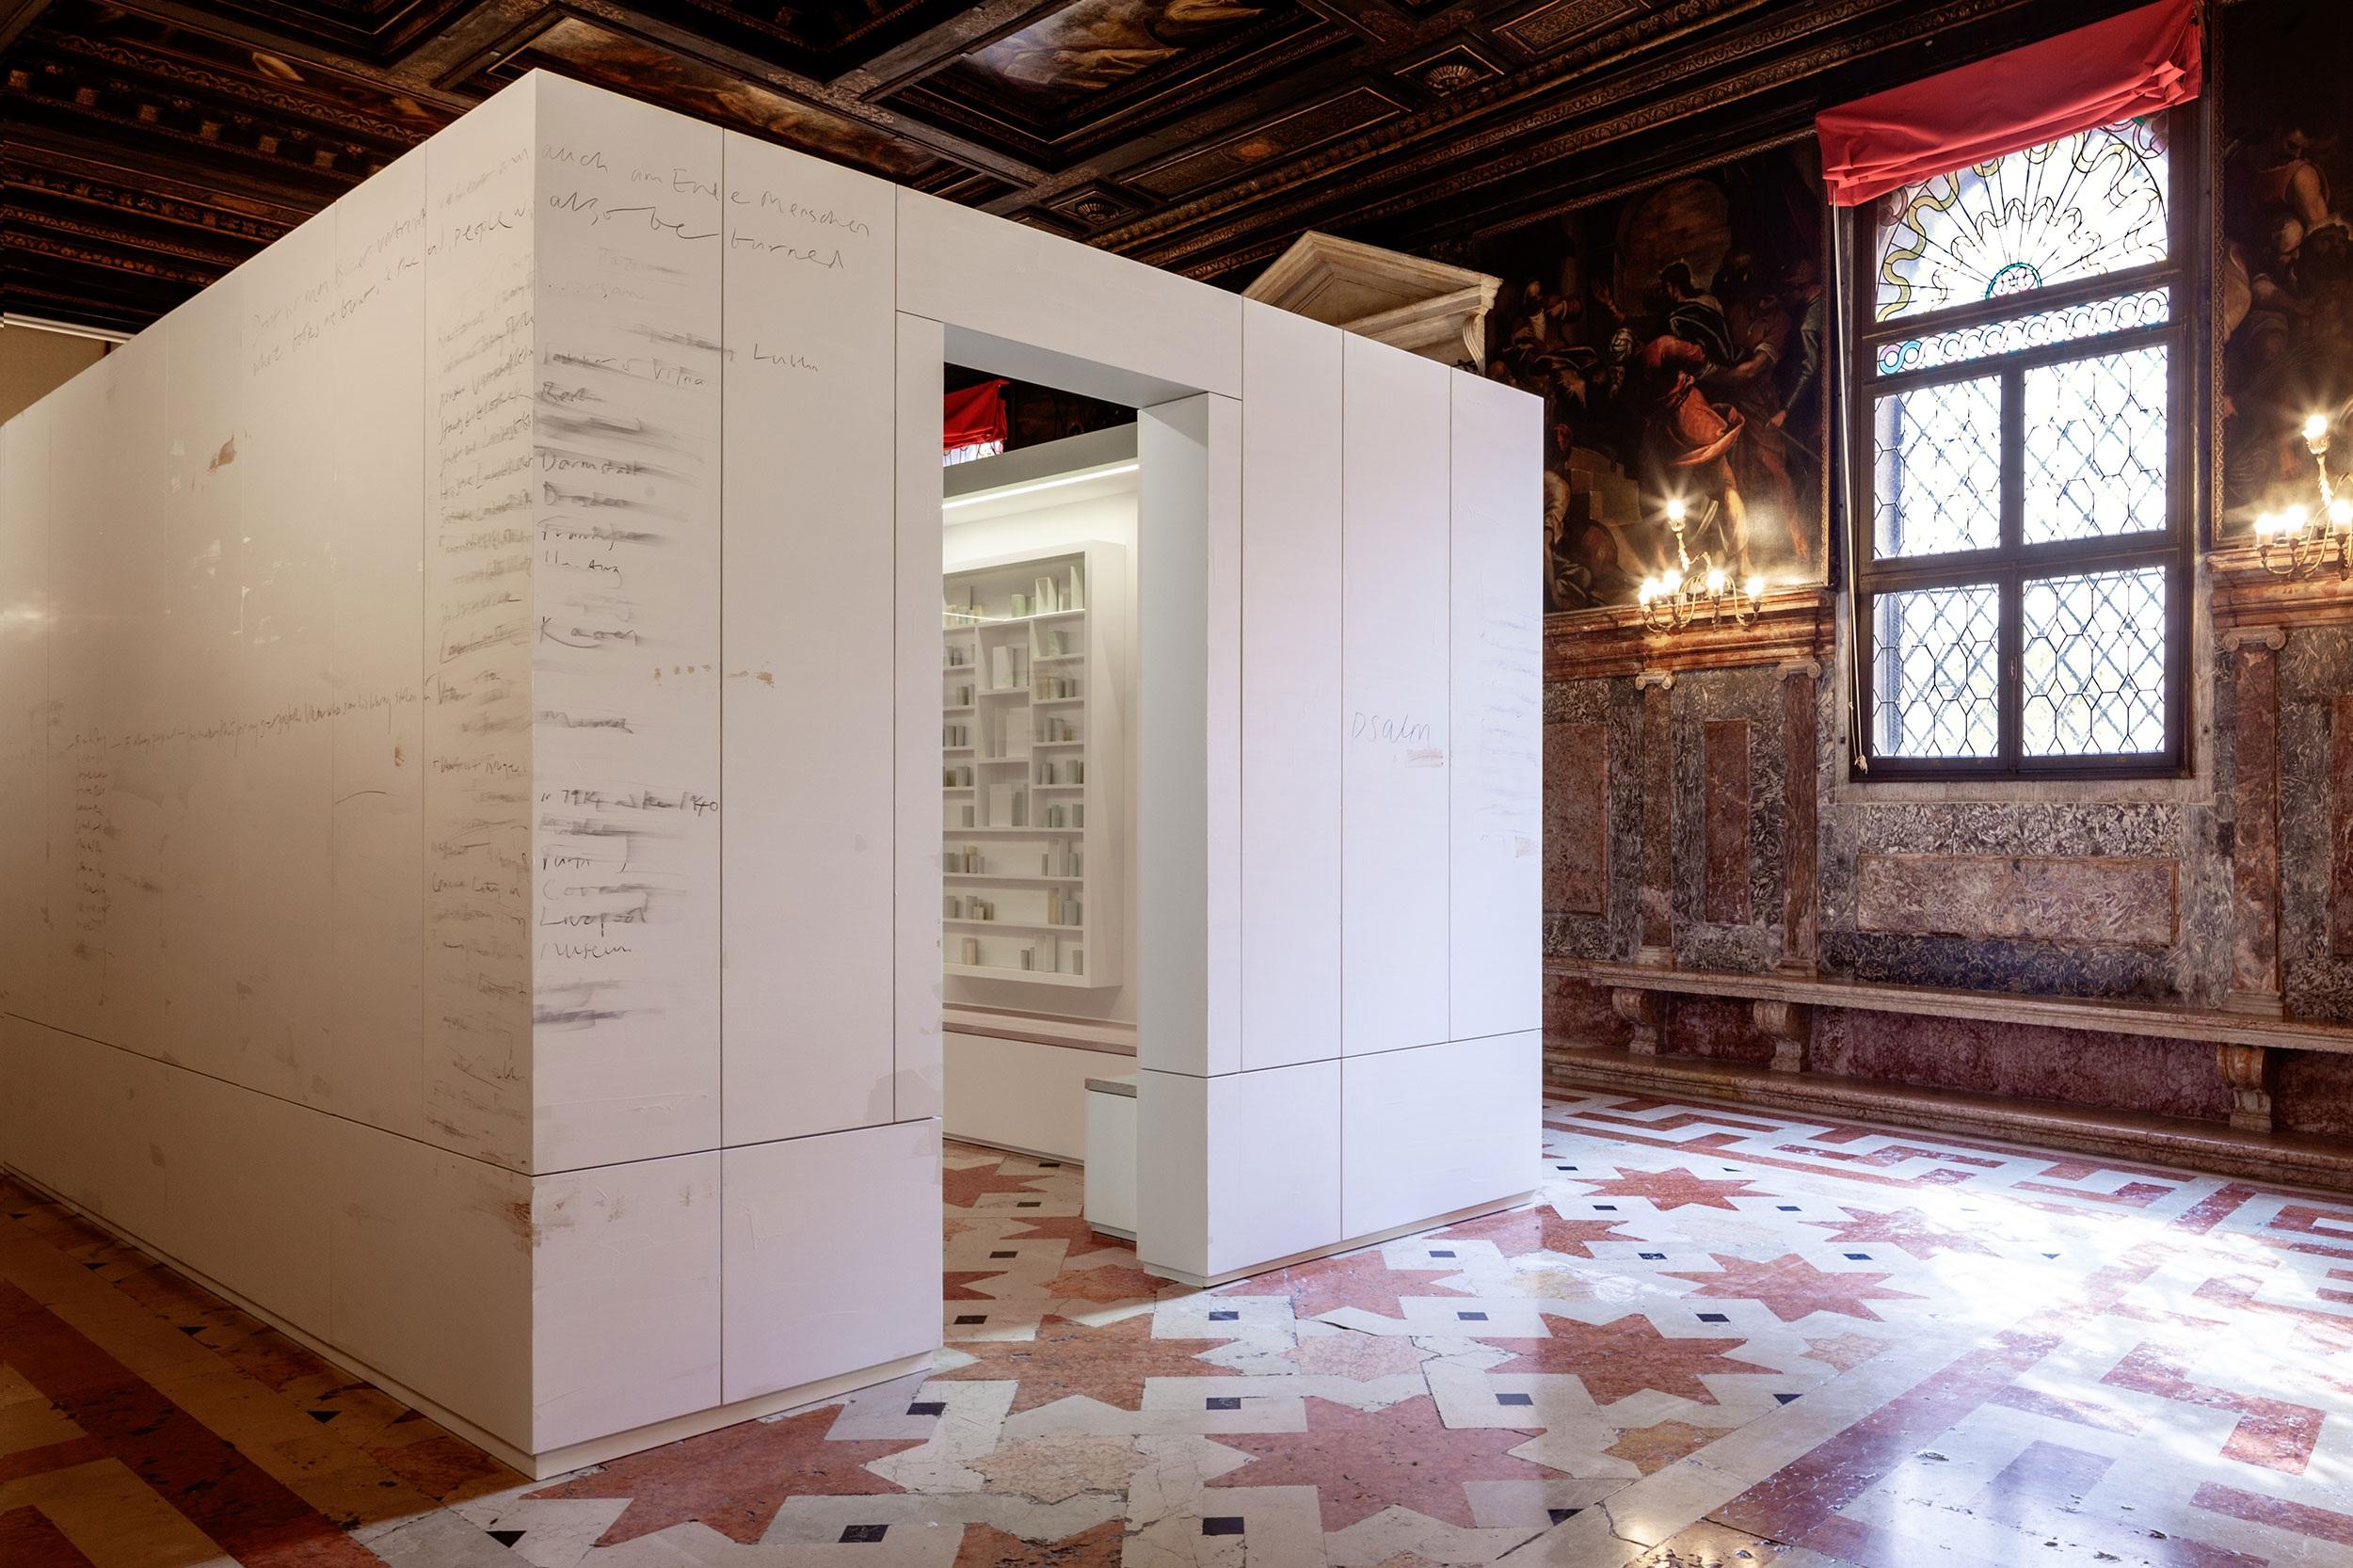 Edmund+de+Waal+Psalm+Venice+Installation+View_11.jpg